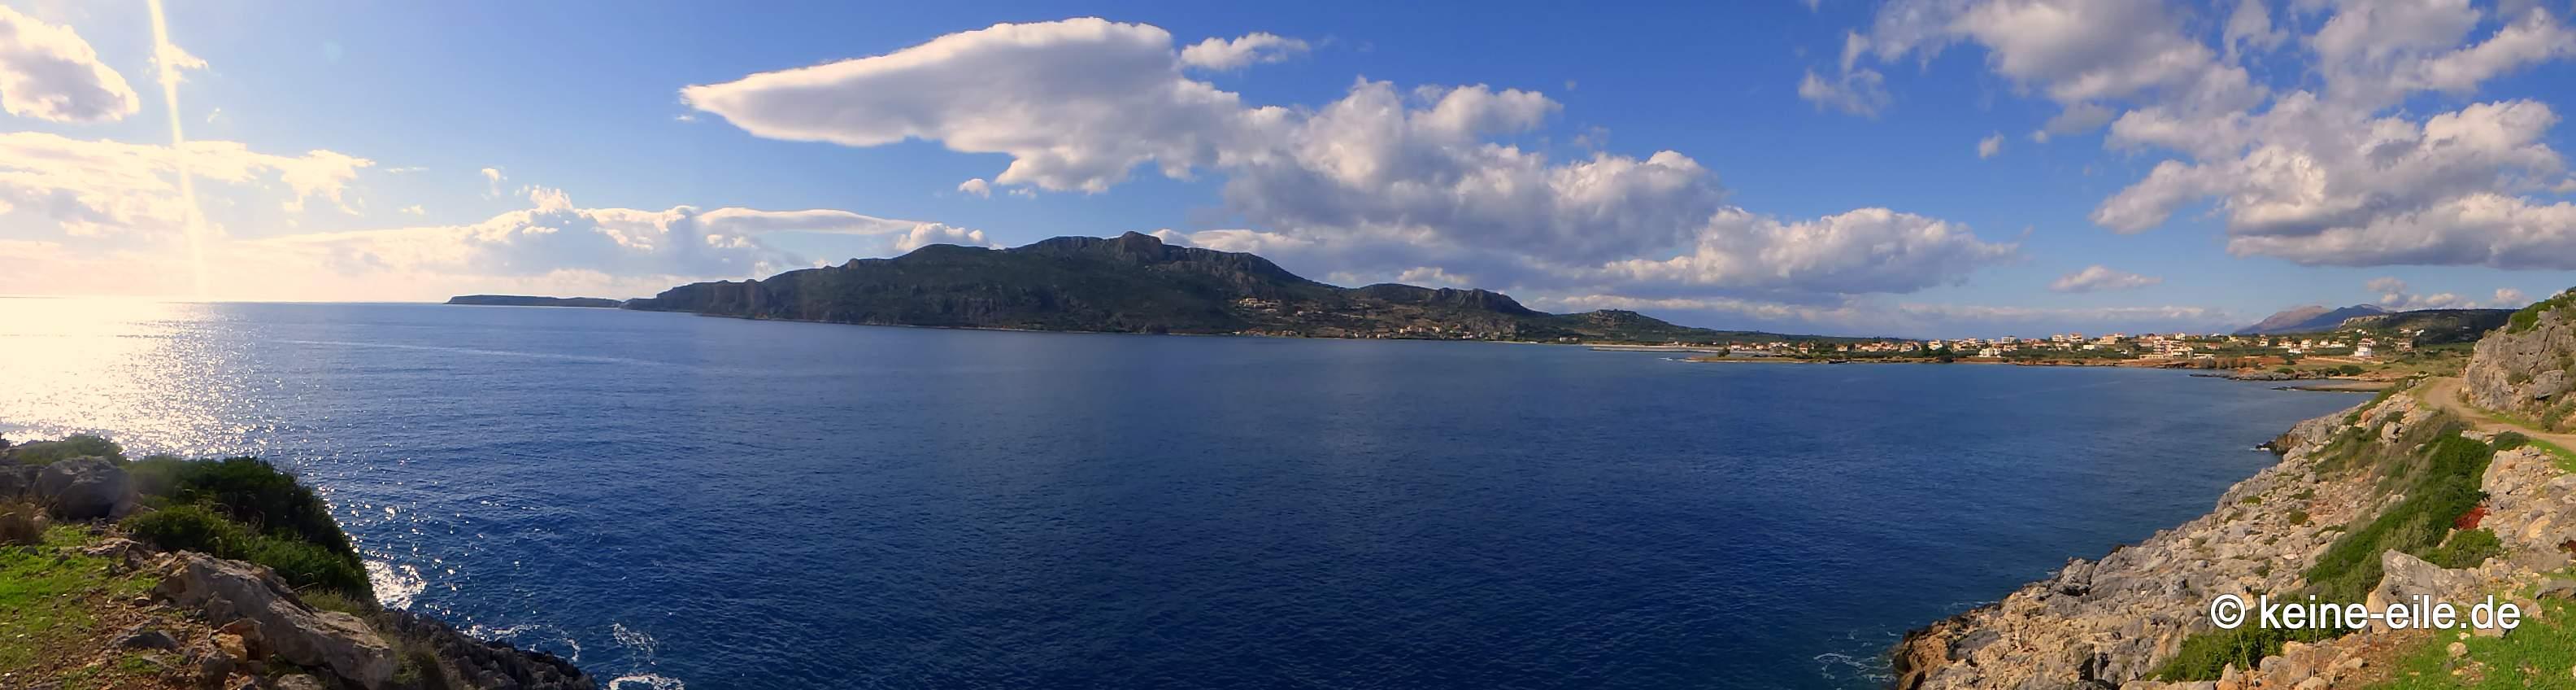 Xili Bay